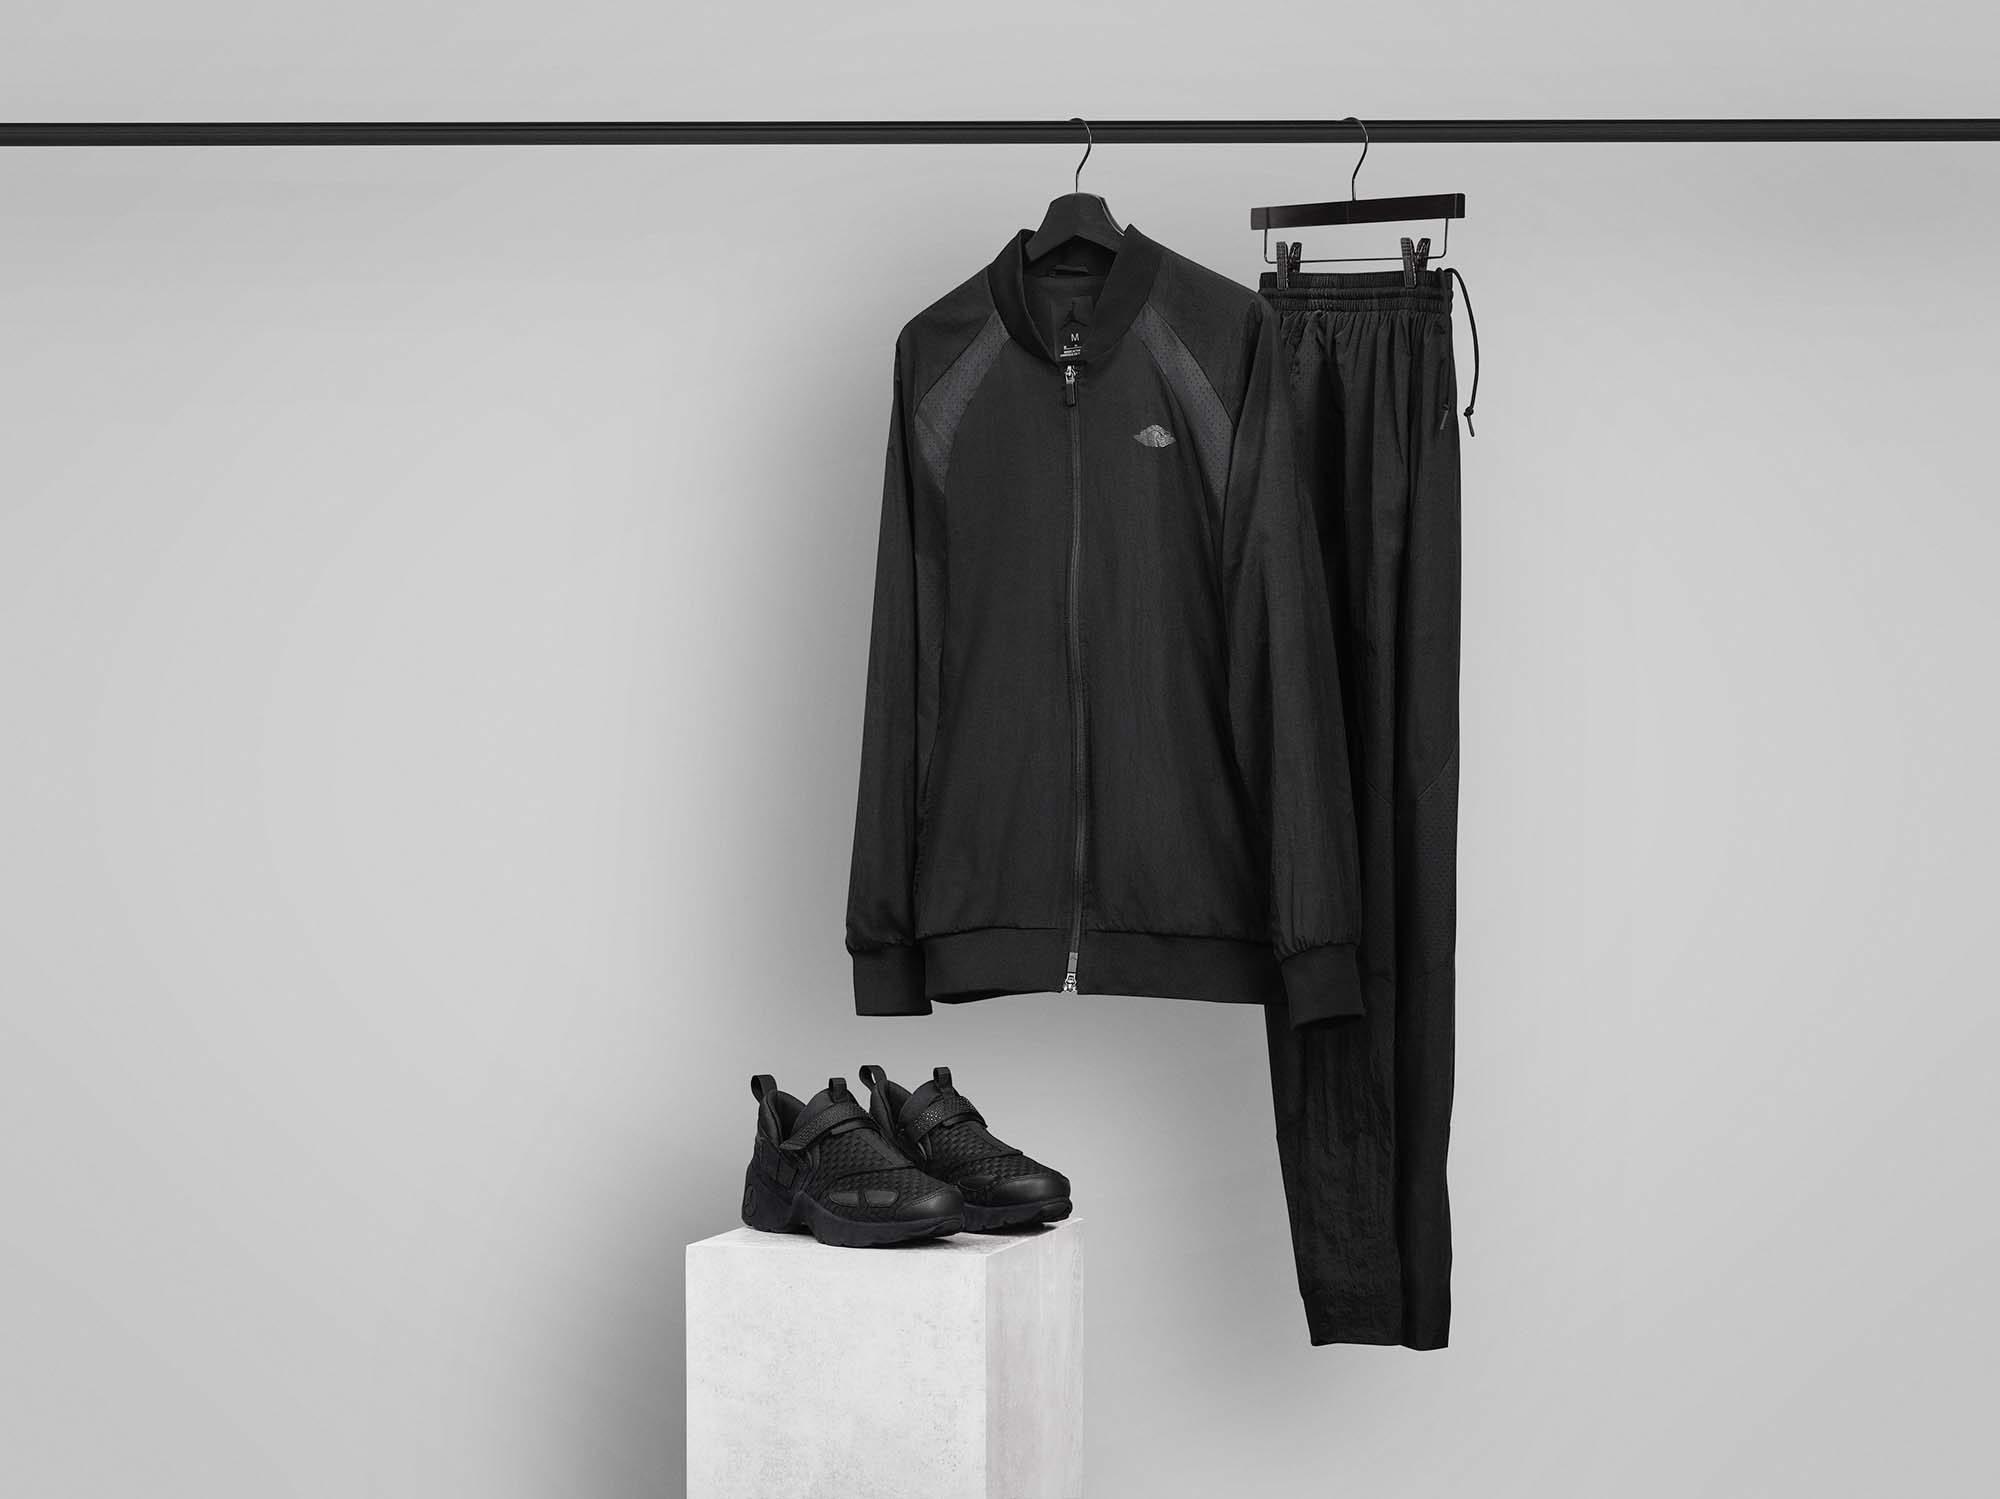 jordan-brand-2017-aw-clothing-collection-009